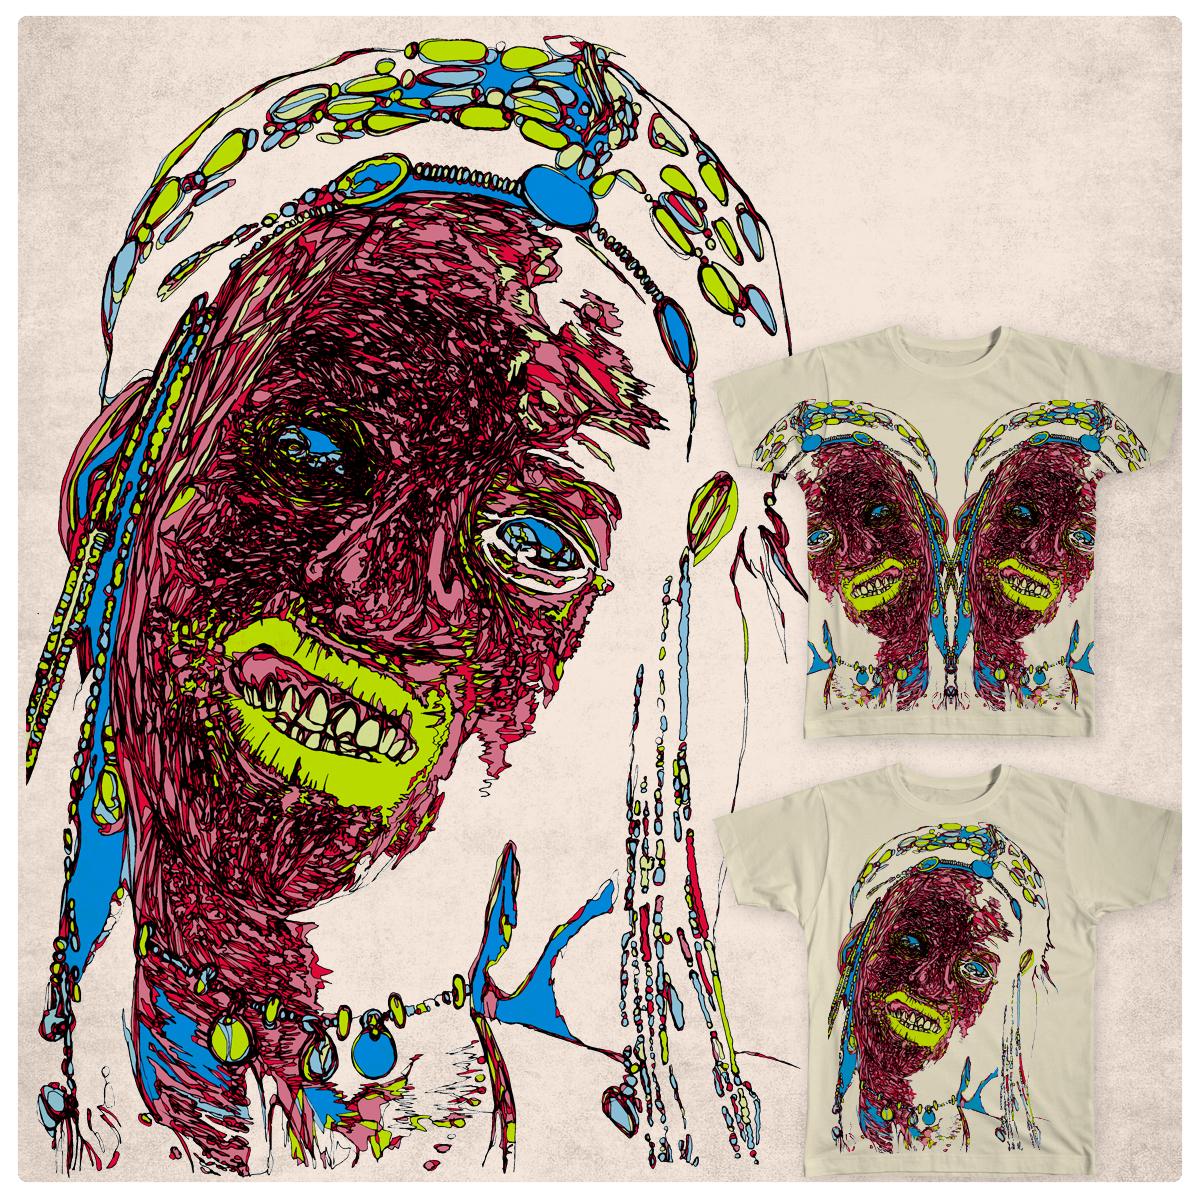 Battery Acid by JylleNavarro on Threadless